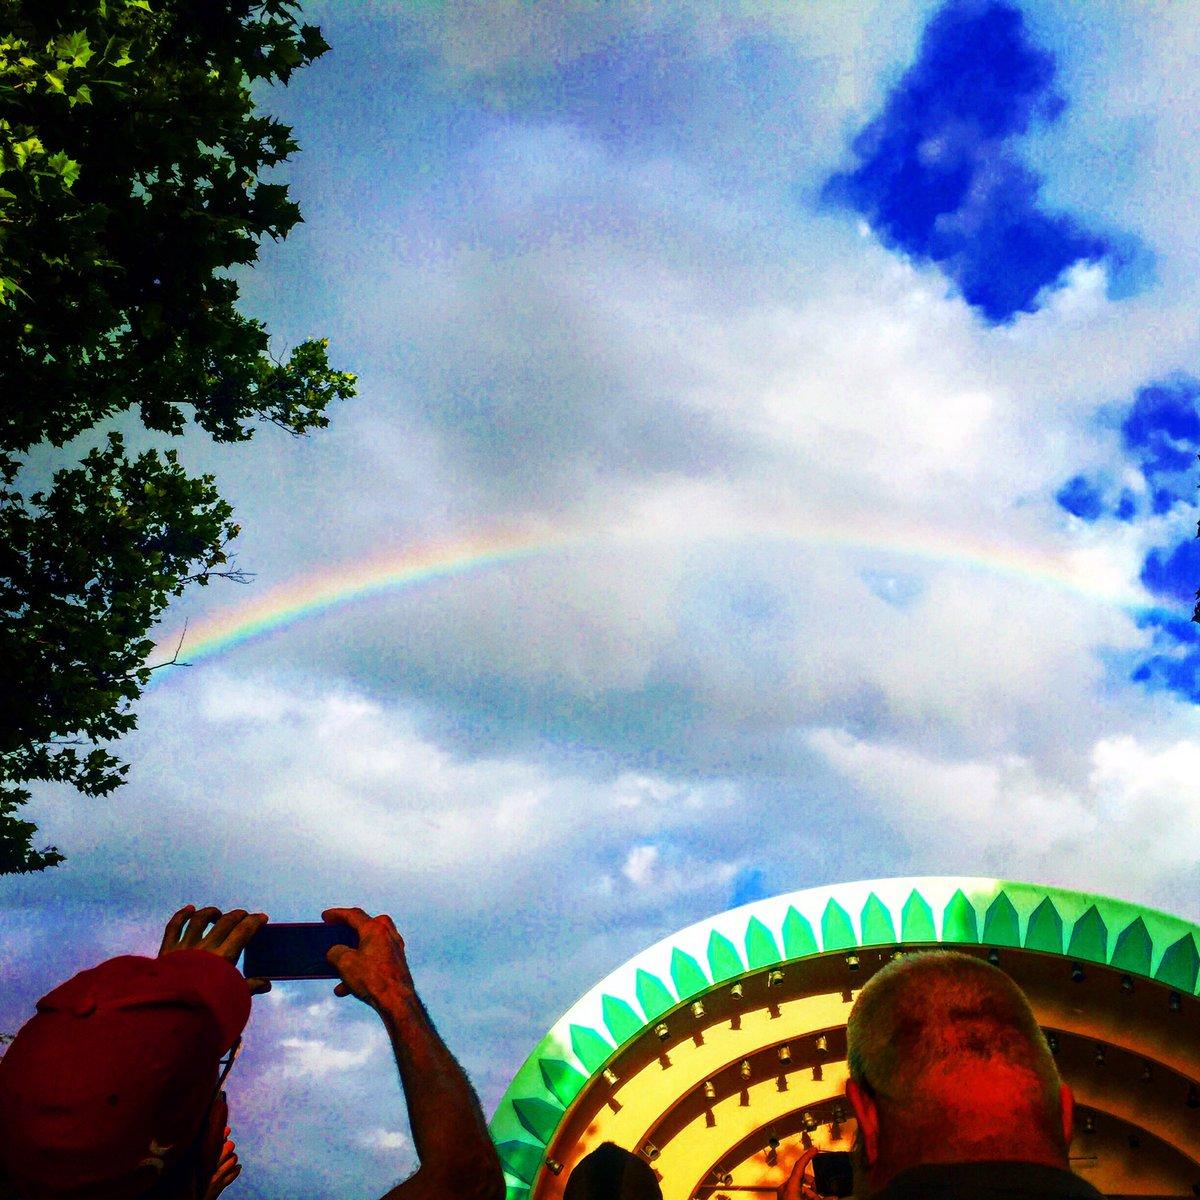 Whaaaaat! Crowd just went nuts as a stunning rainbow appeared over Lake Eola vigil @WESH https://t.co/iDjB74IjtT